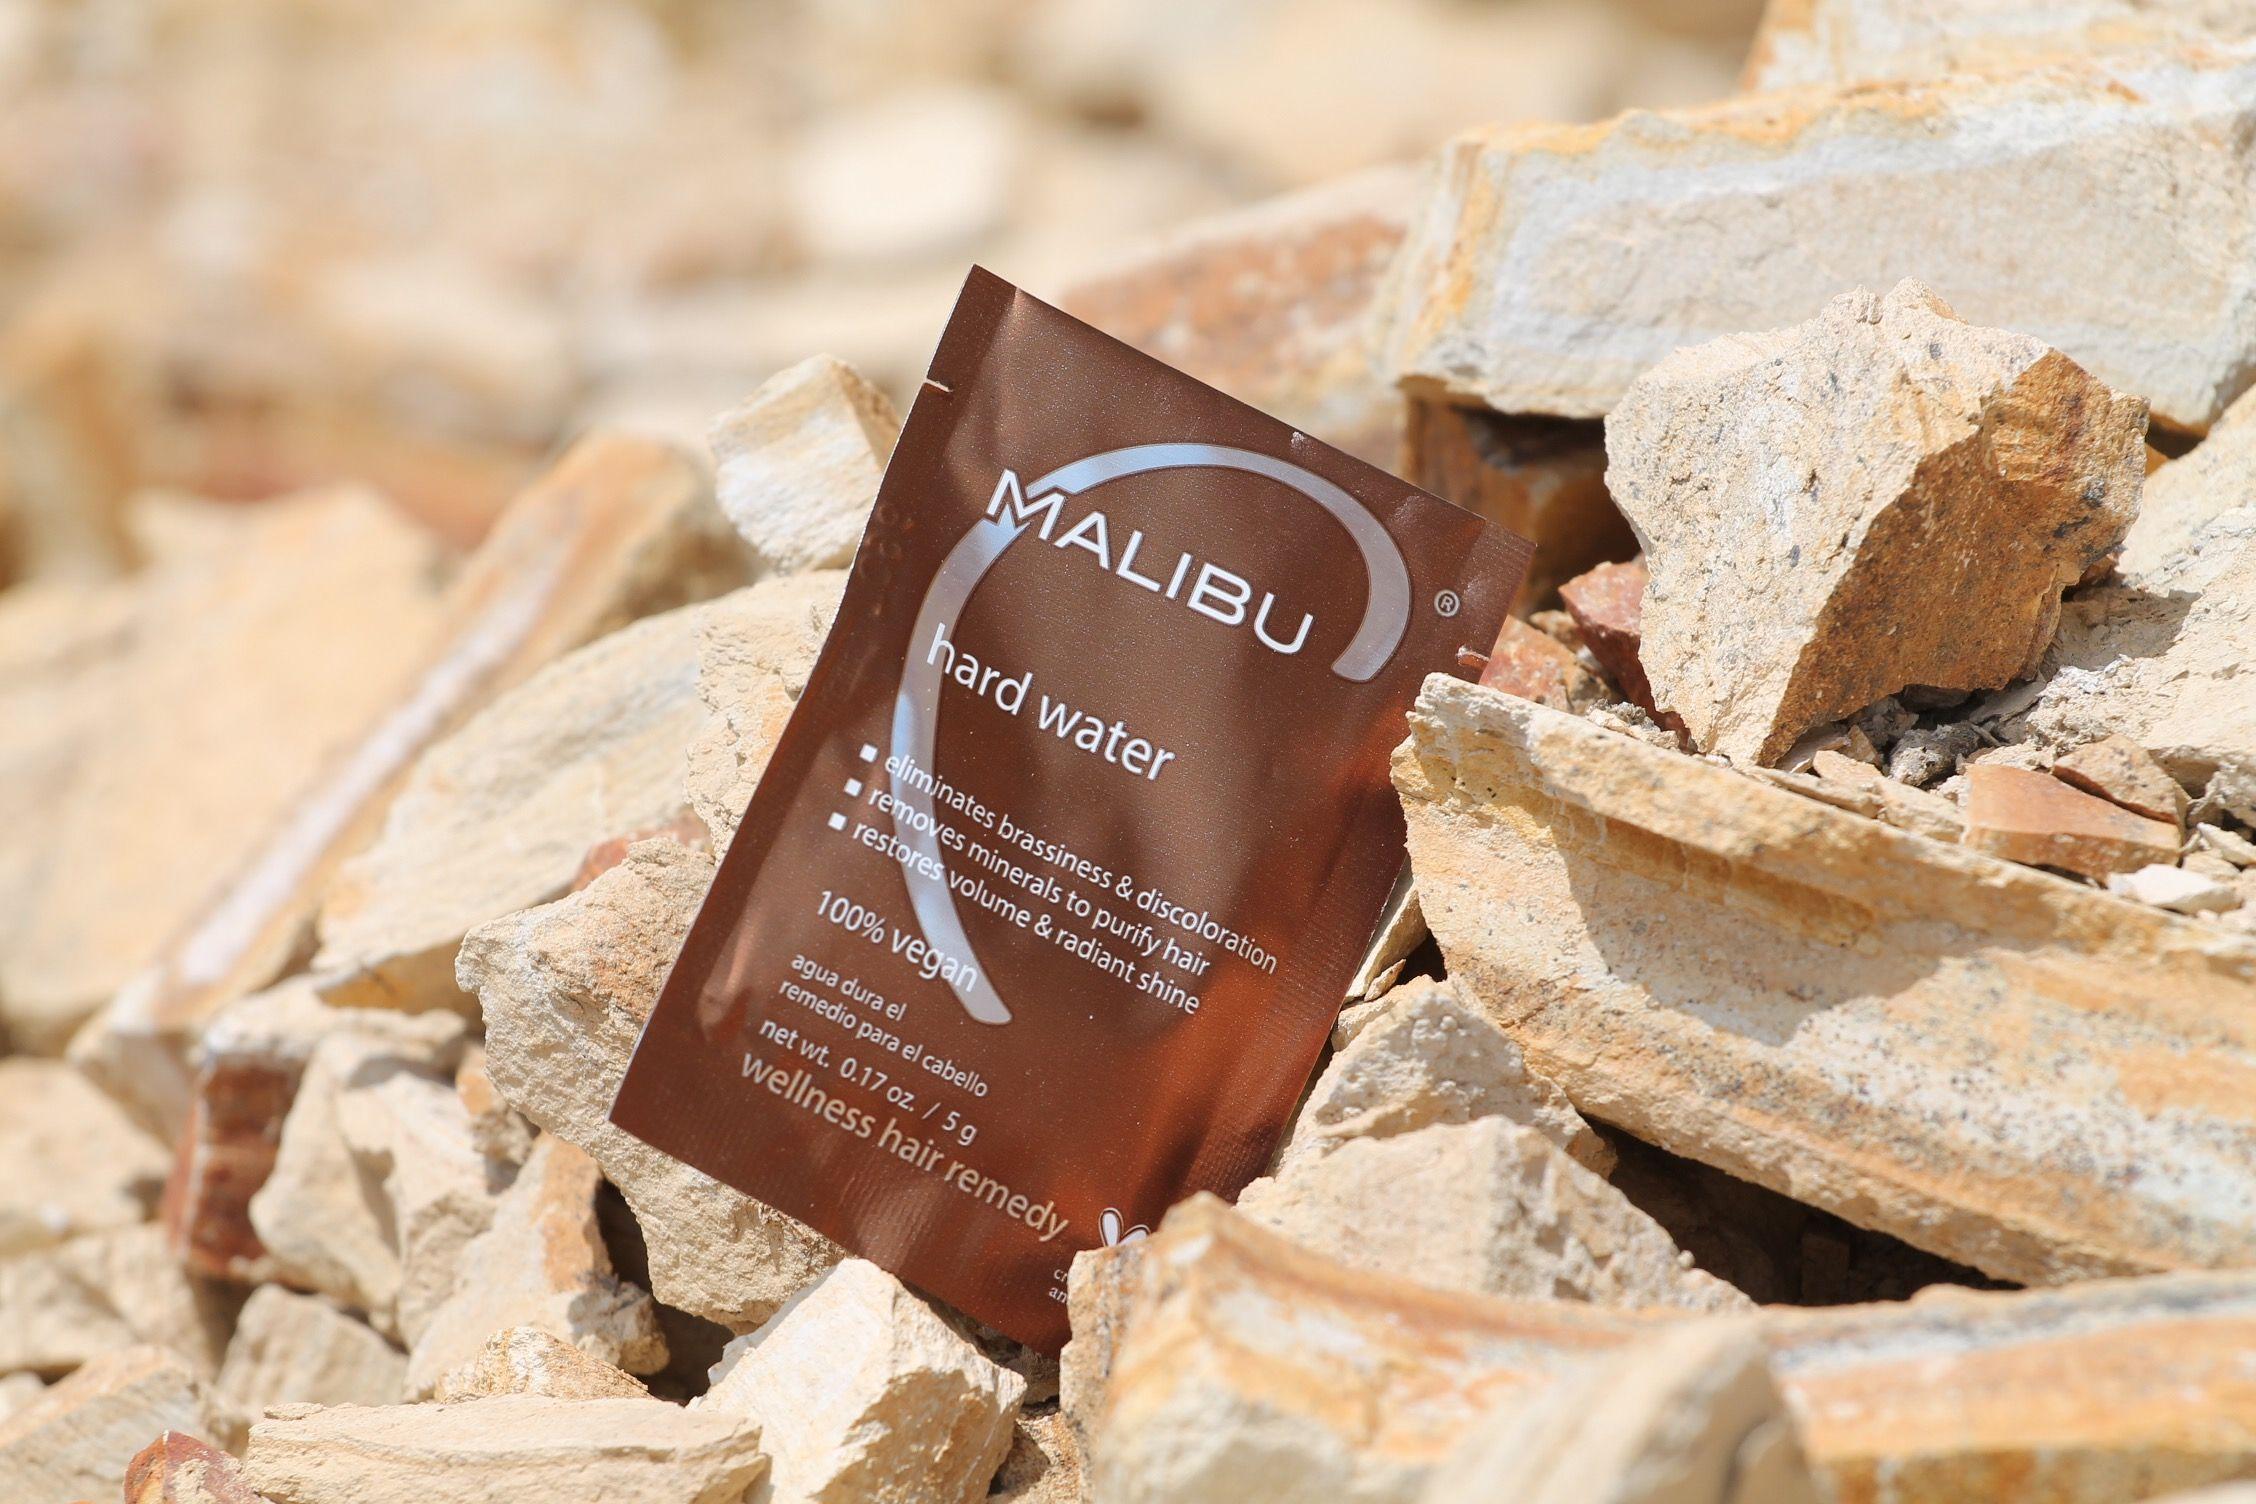 Hard Water Wellness Remedy - By Malibu C® | Wellness Remedies ...